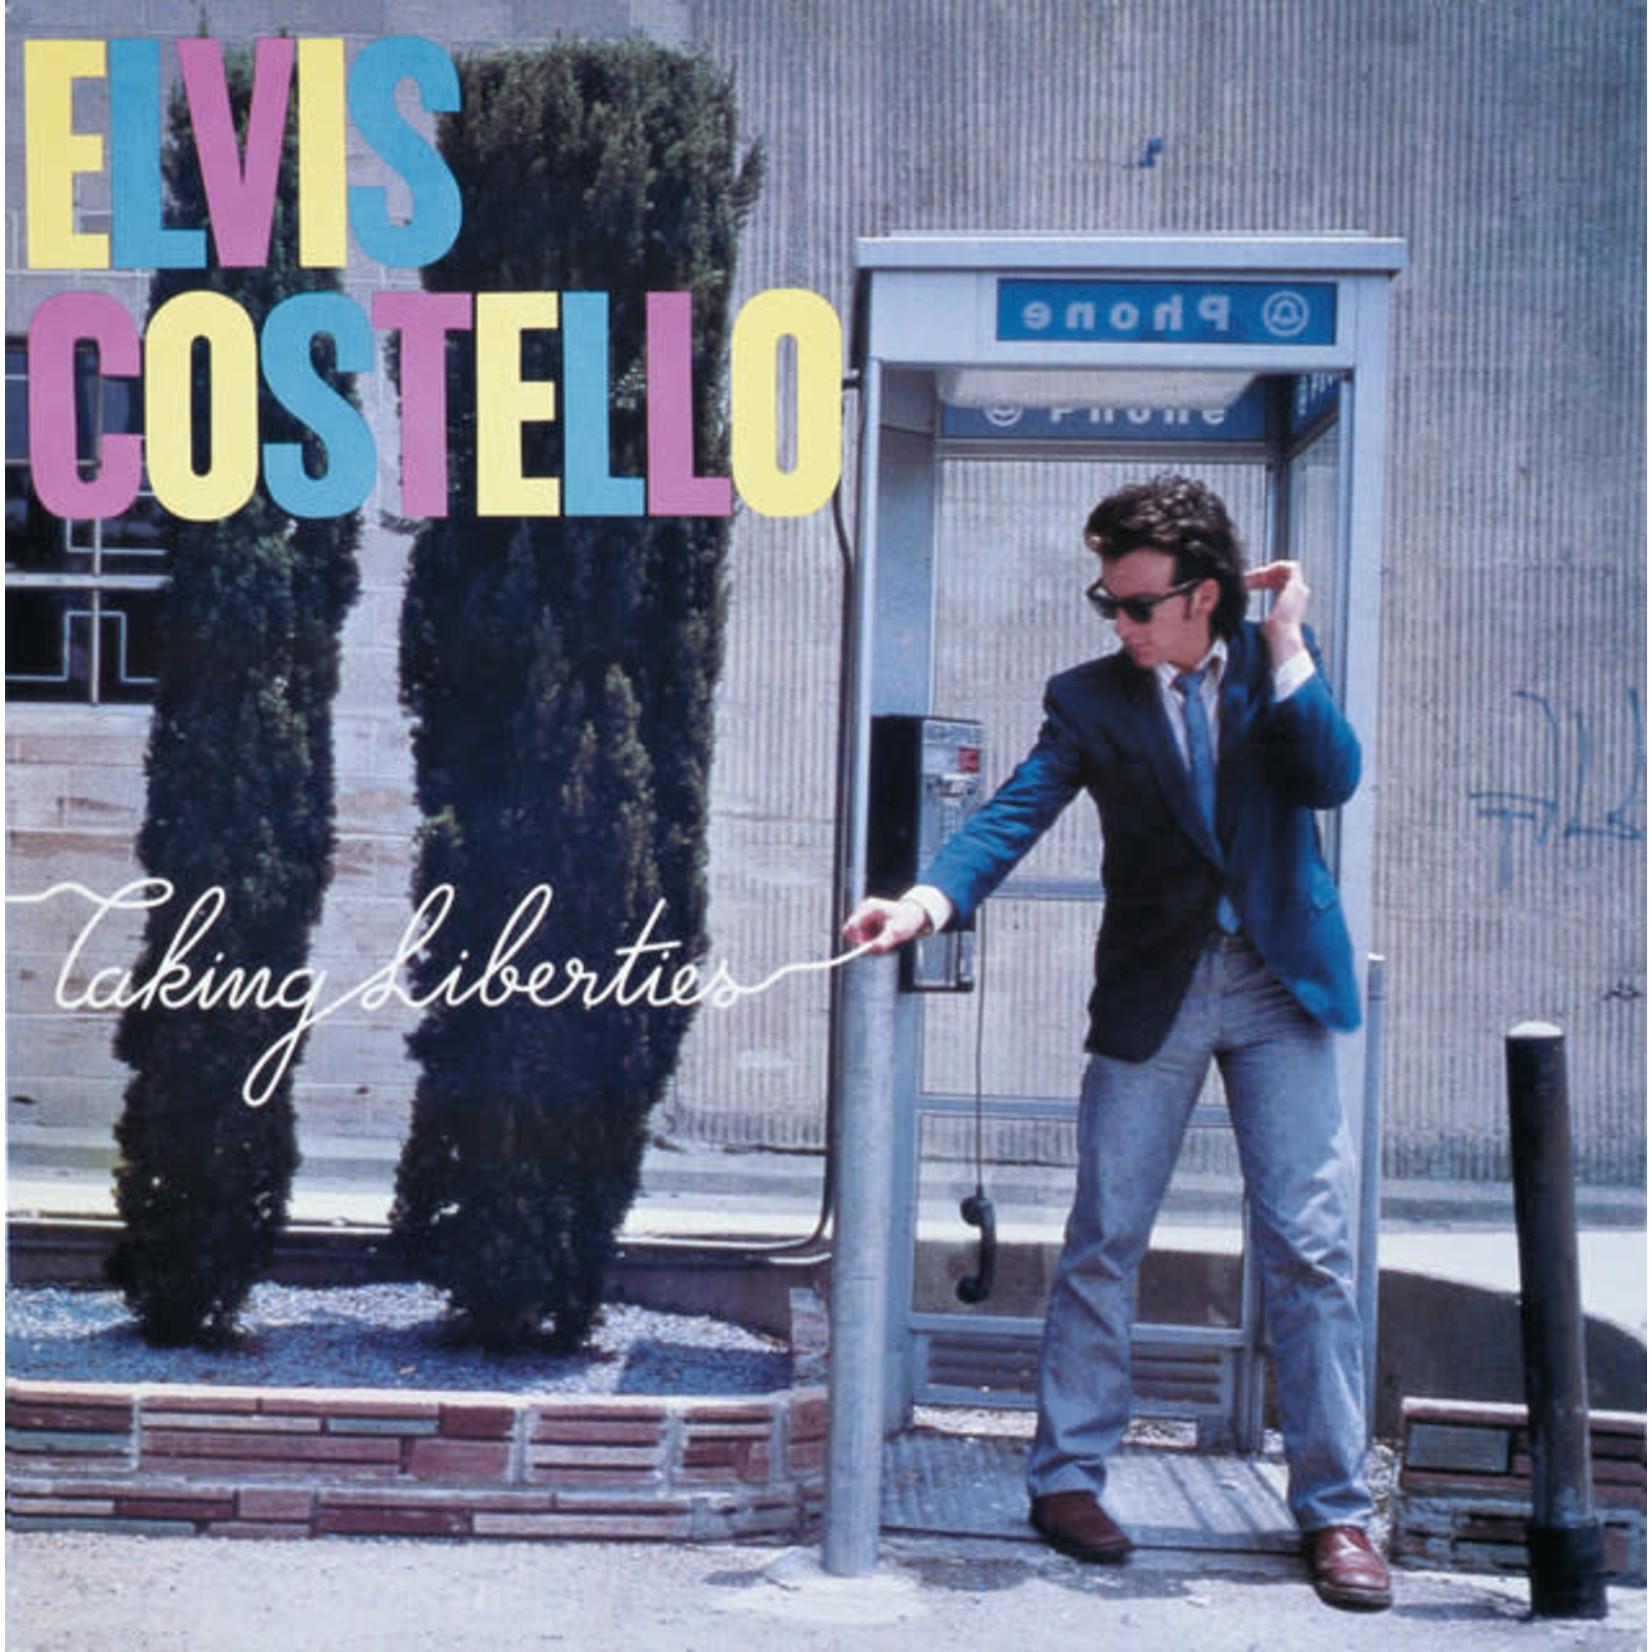 Vinyl Elvis Costello - Taking Liberties